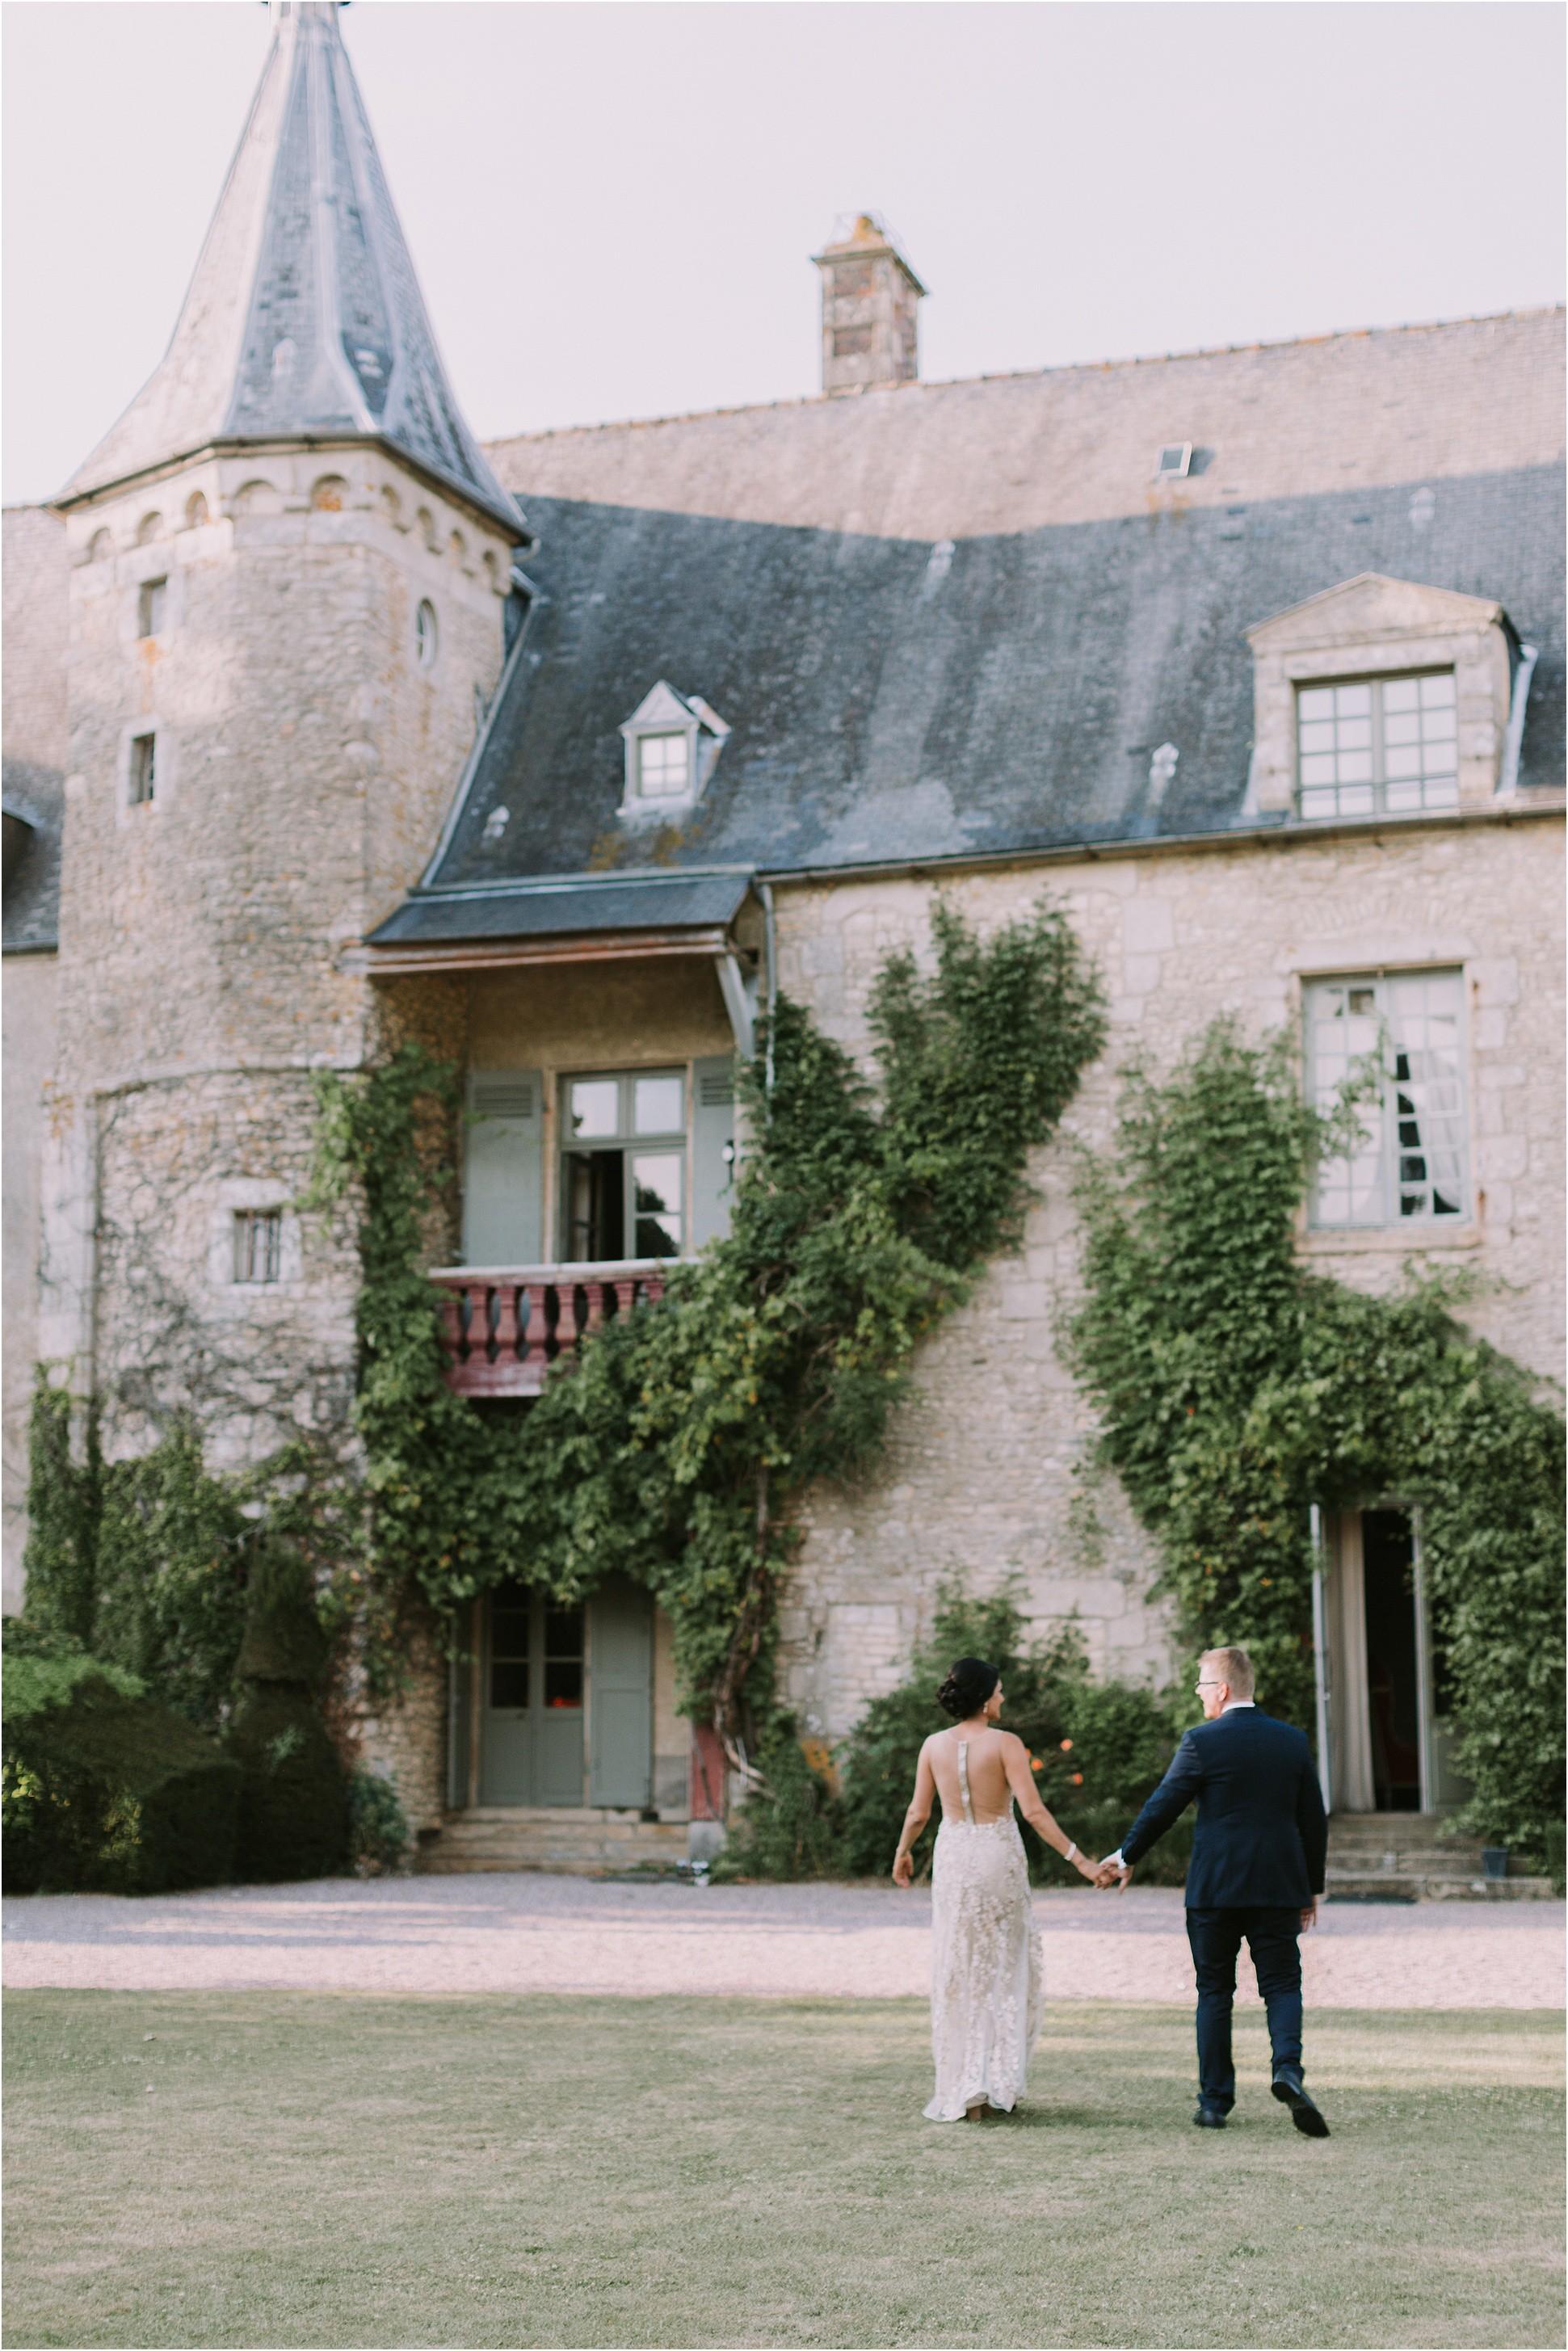 Kateryna-photos-photographe-mariage-chateau-st-paterne-mayenne-normandie_0169.jpg